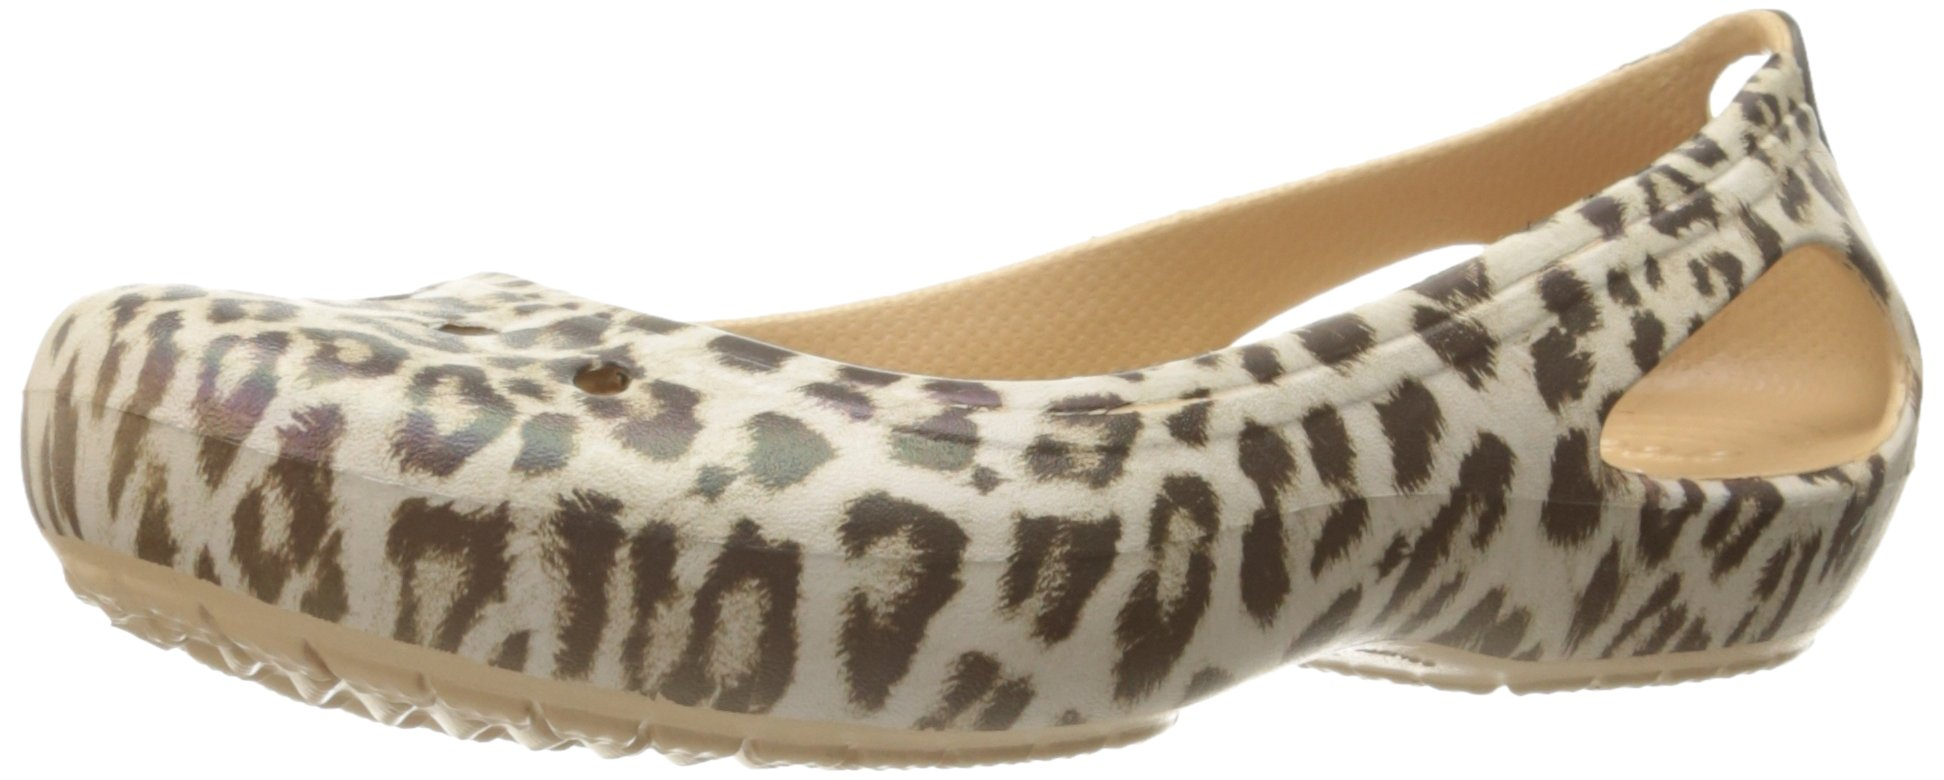 82ff6e657e8c6f Crocs Women s Kadee Graphic Ballet Flat Leopard 4 M US 887350850000 ...